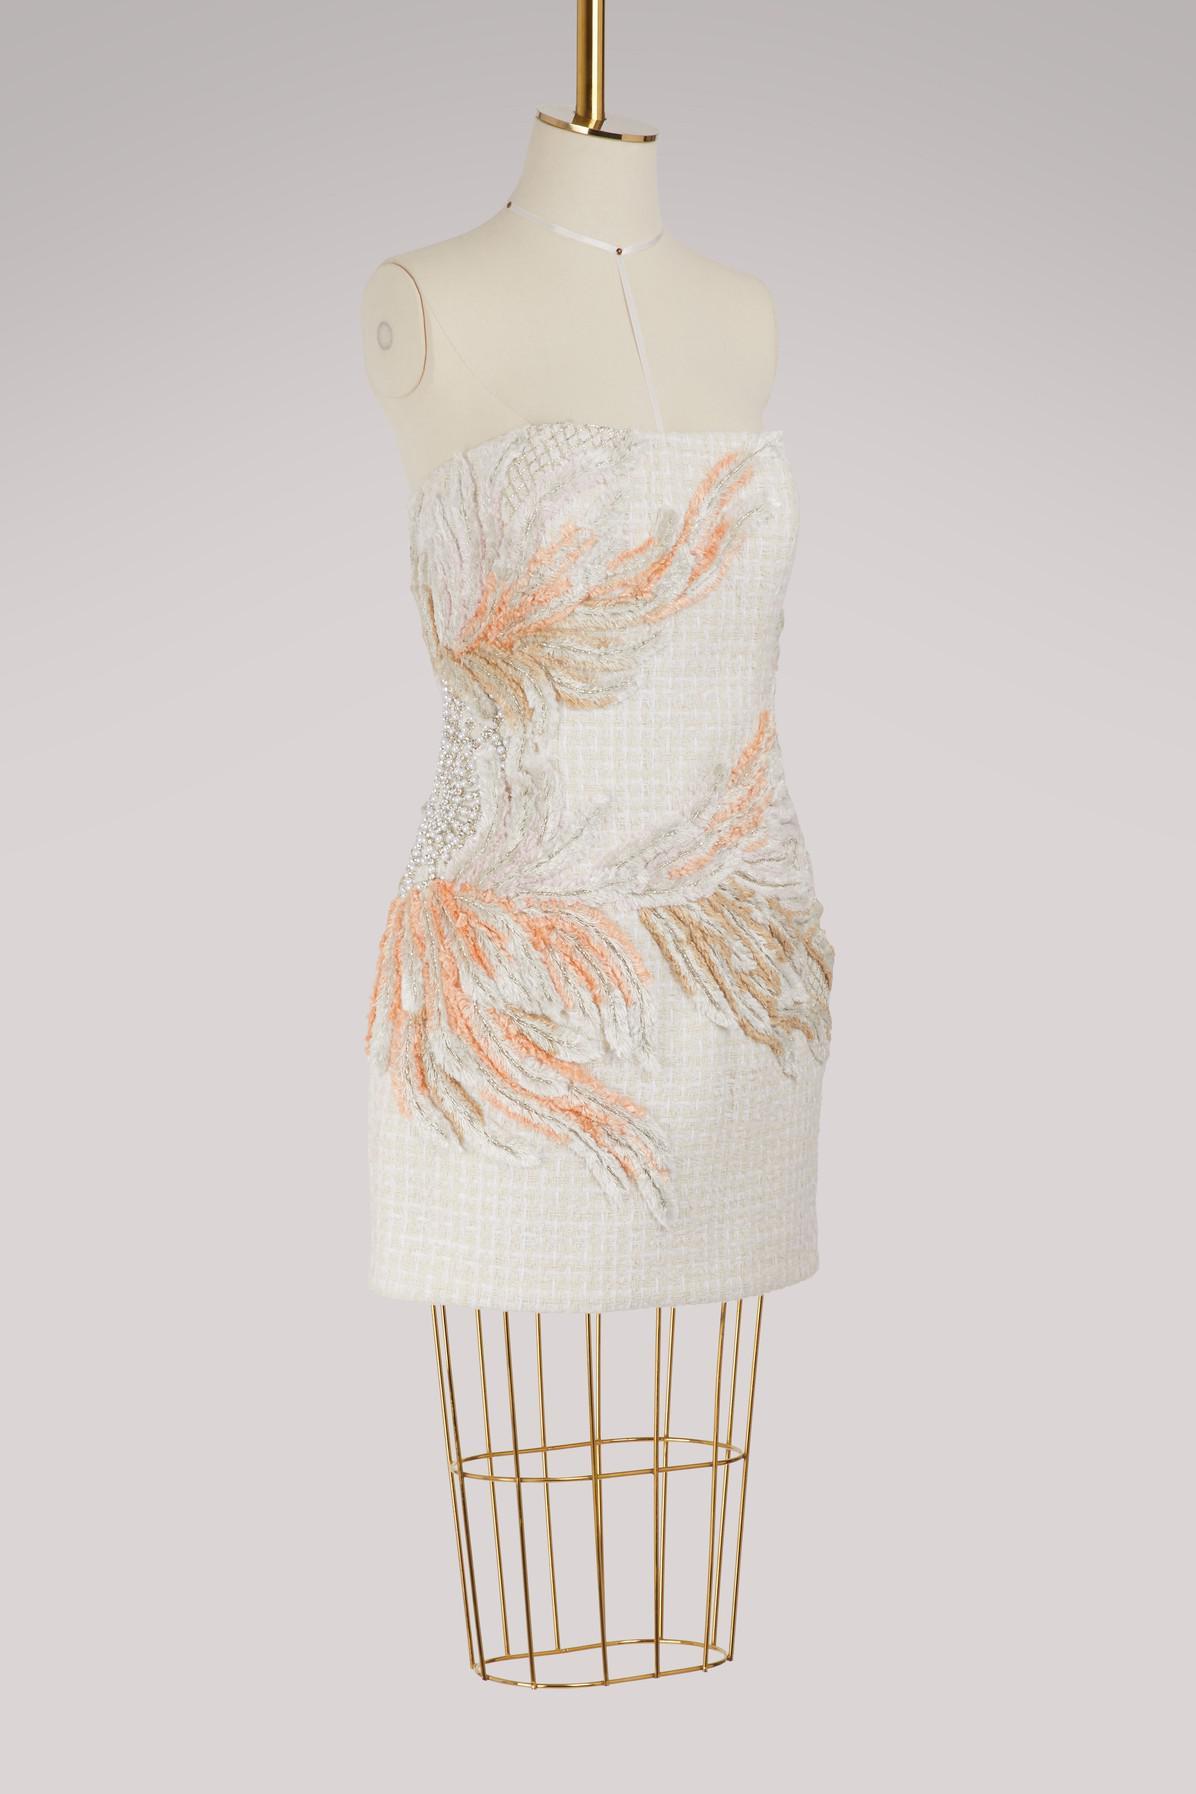 462ebde4 Lyst - Balmain Embroidered Strapless Dress